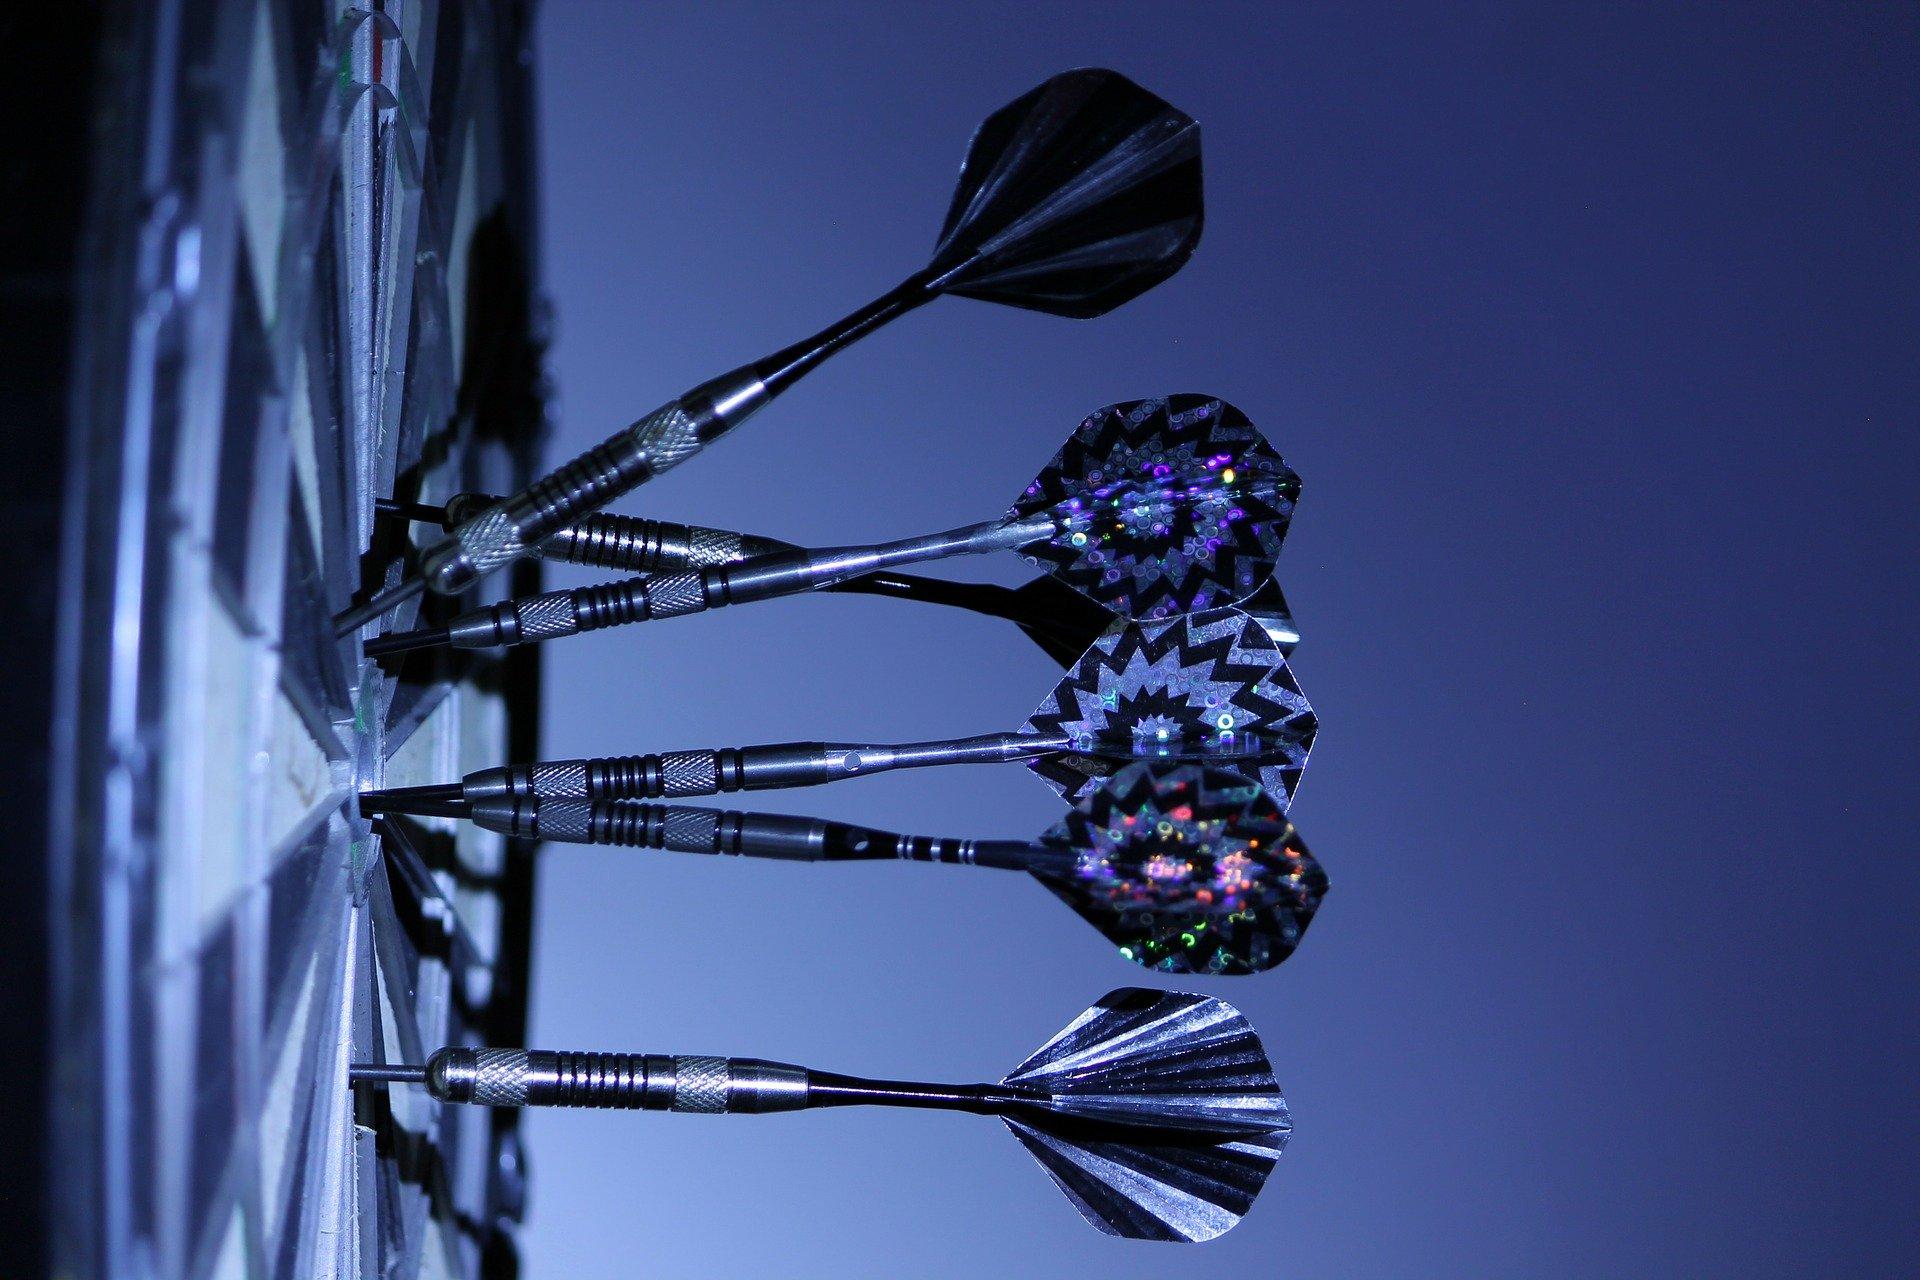 Marketing segementation, targeting and positioning, B2B marketing